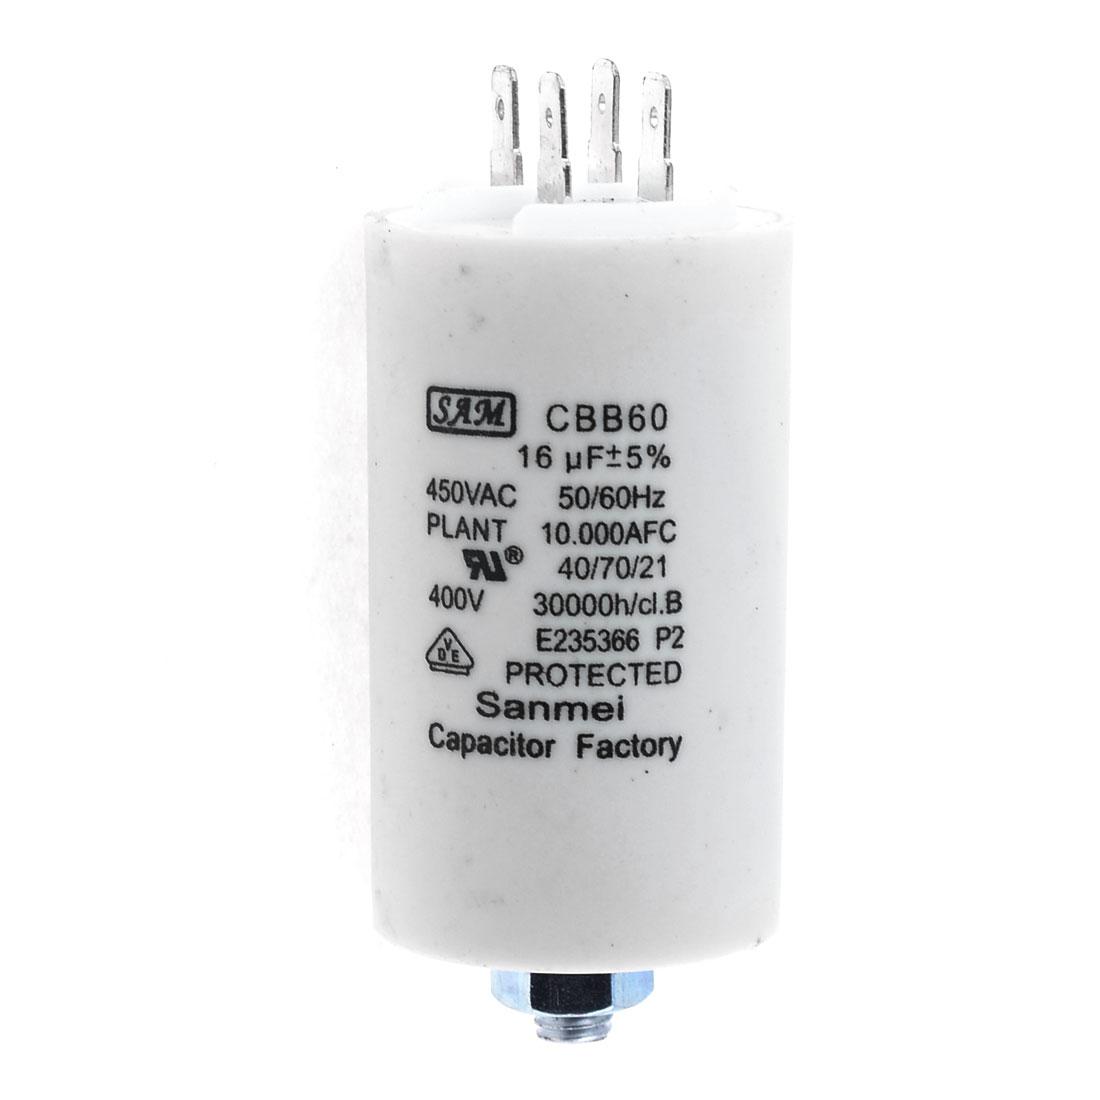 Washers White Motor Running Capacitor 16uF AC 450V CBB60